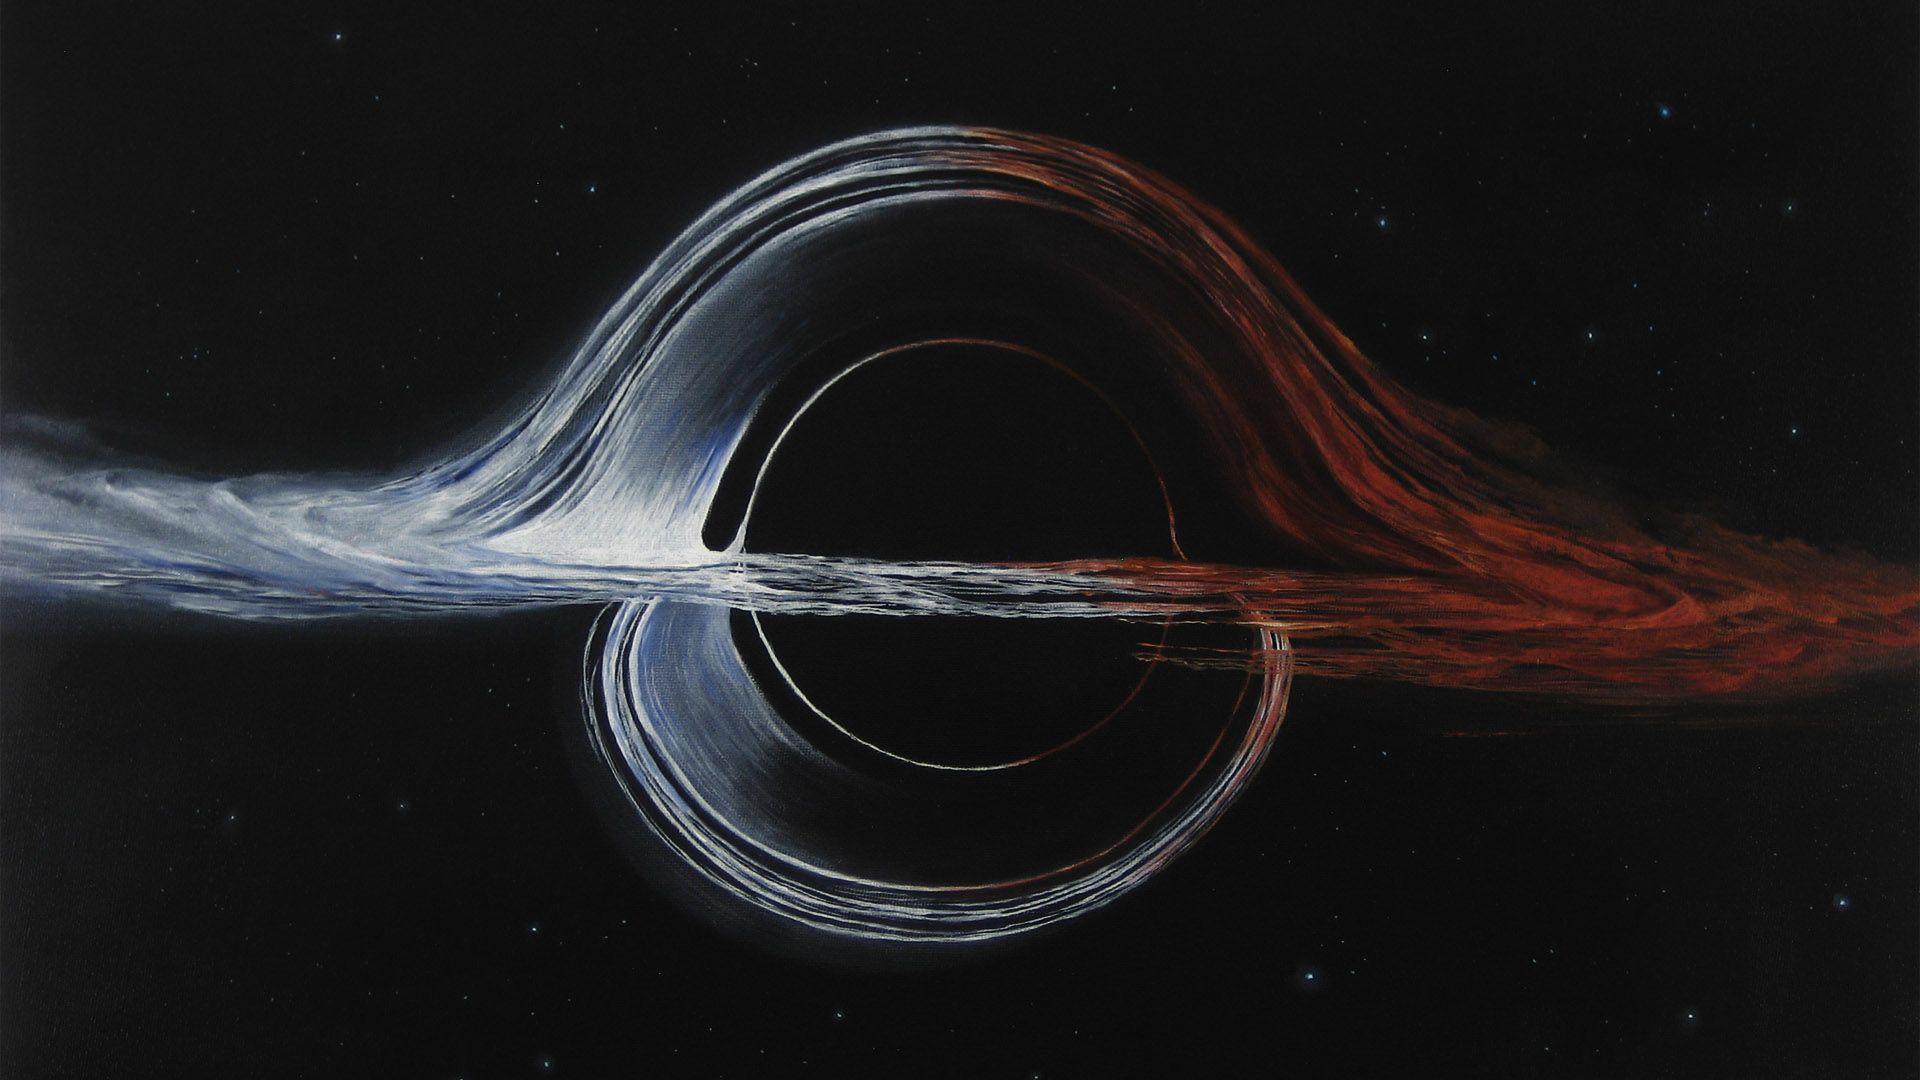 Black Hole Wallpaper Black Hole Free Black